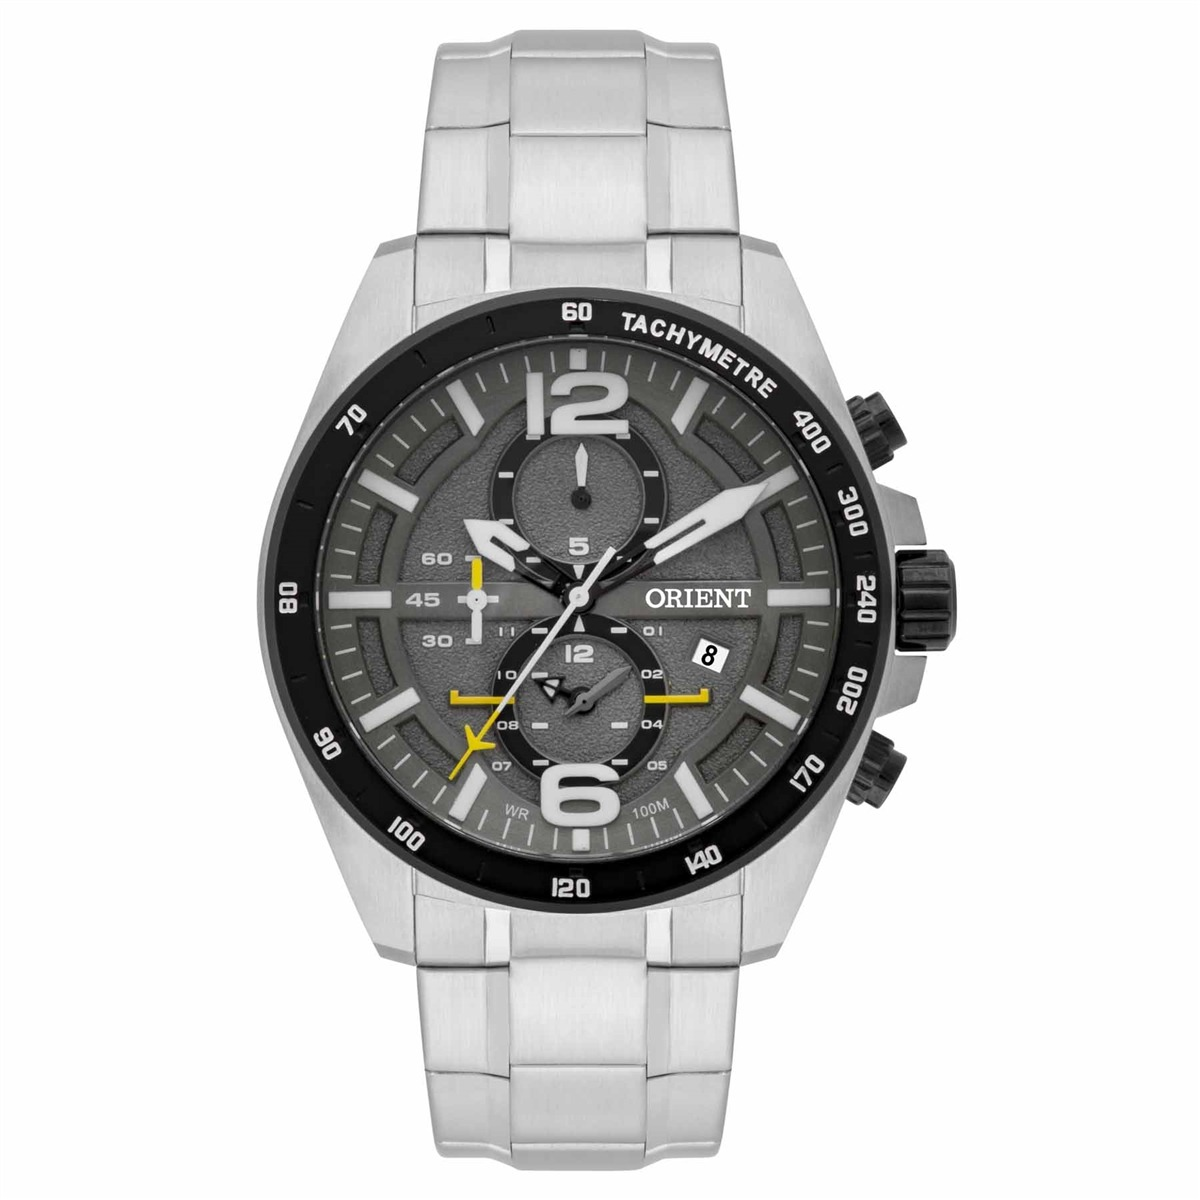 43028cf6a96 Relógio Orient Cronógrafo Analógico Masculino Mbssc165 G2sx - R  839 ...